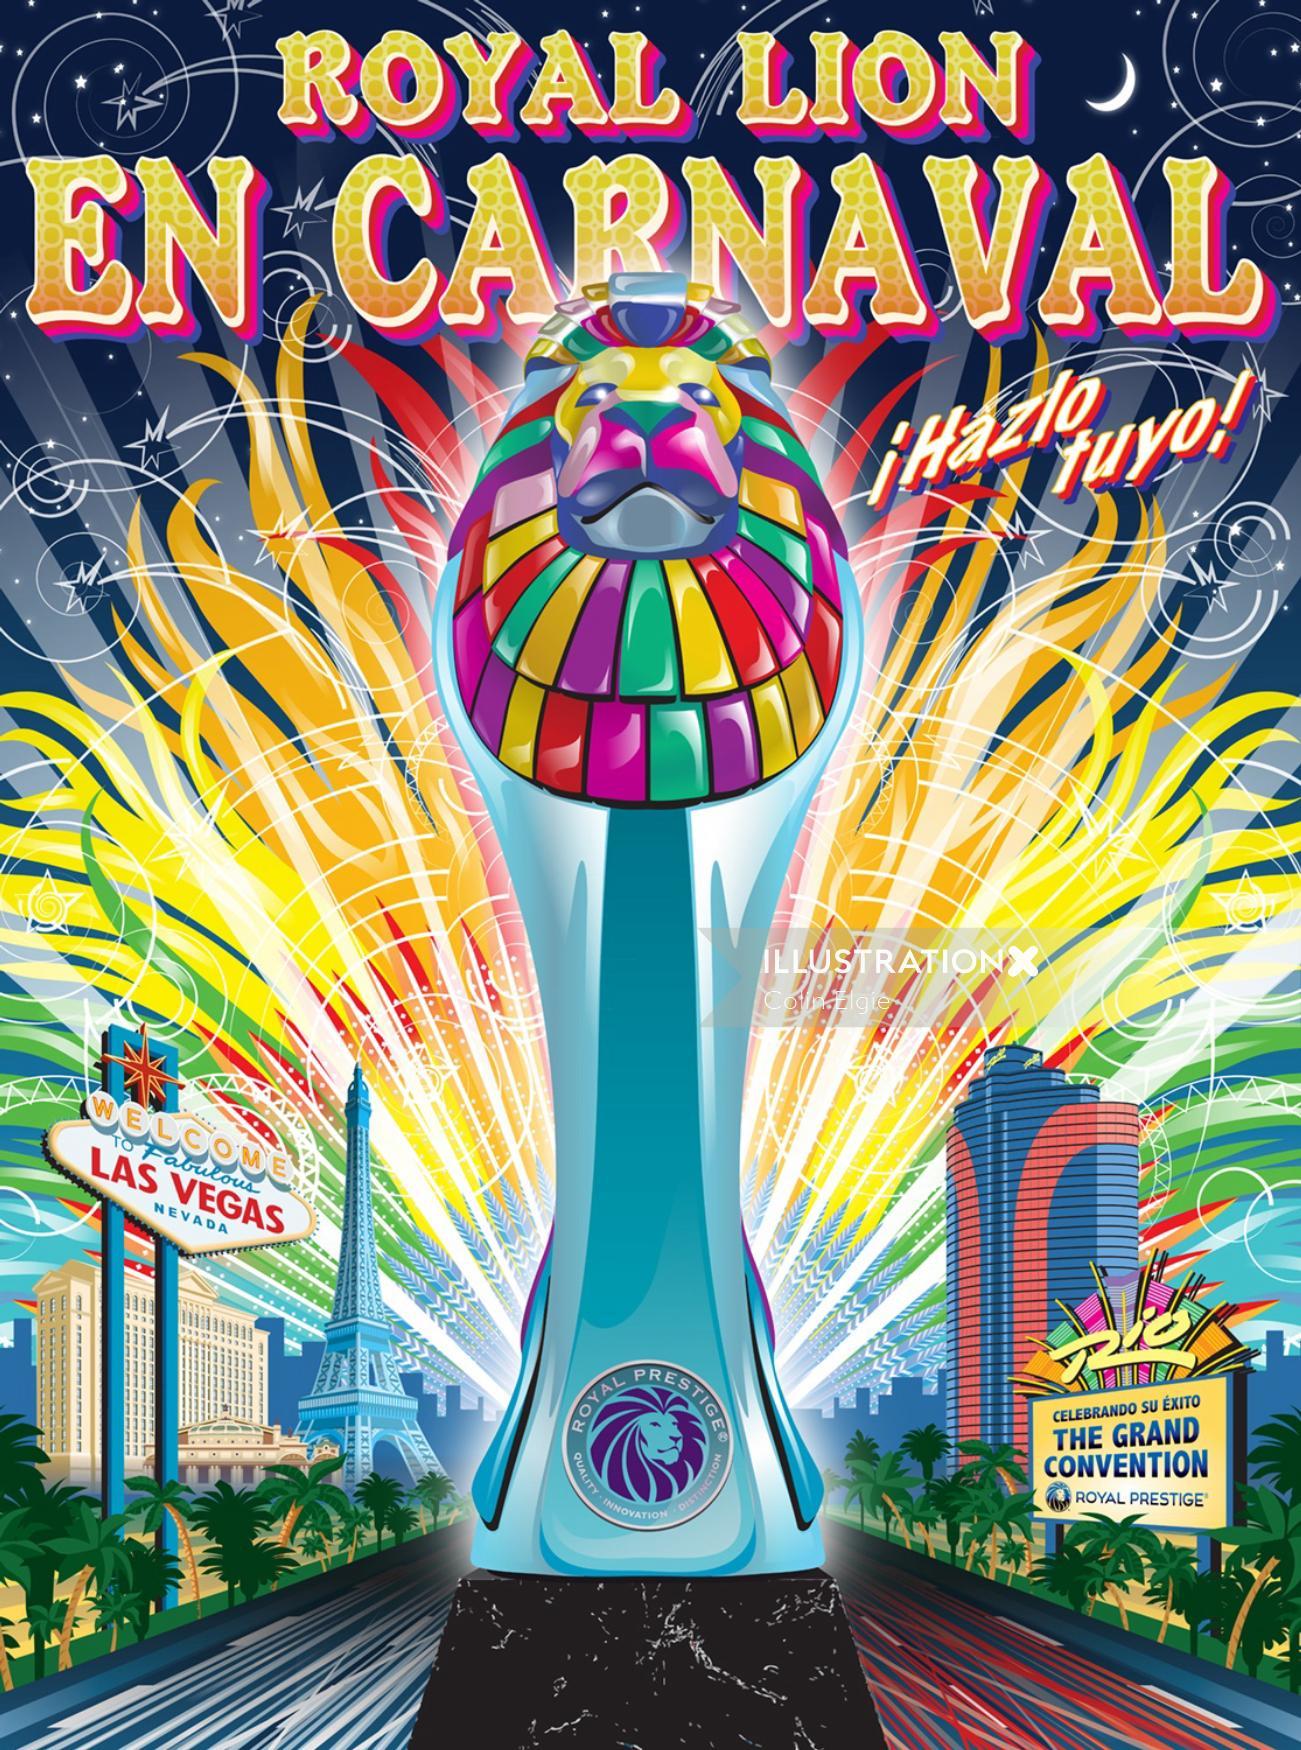 Las Vegas Convention Poster